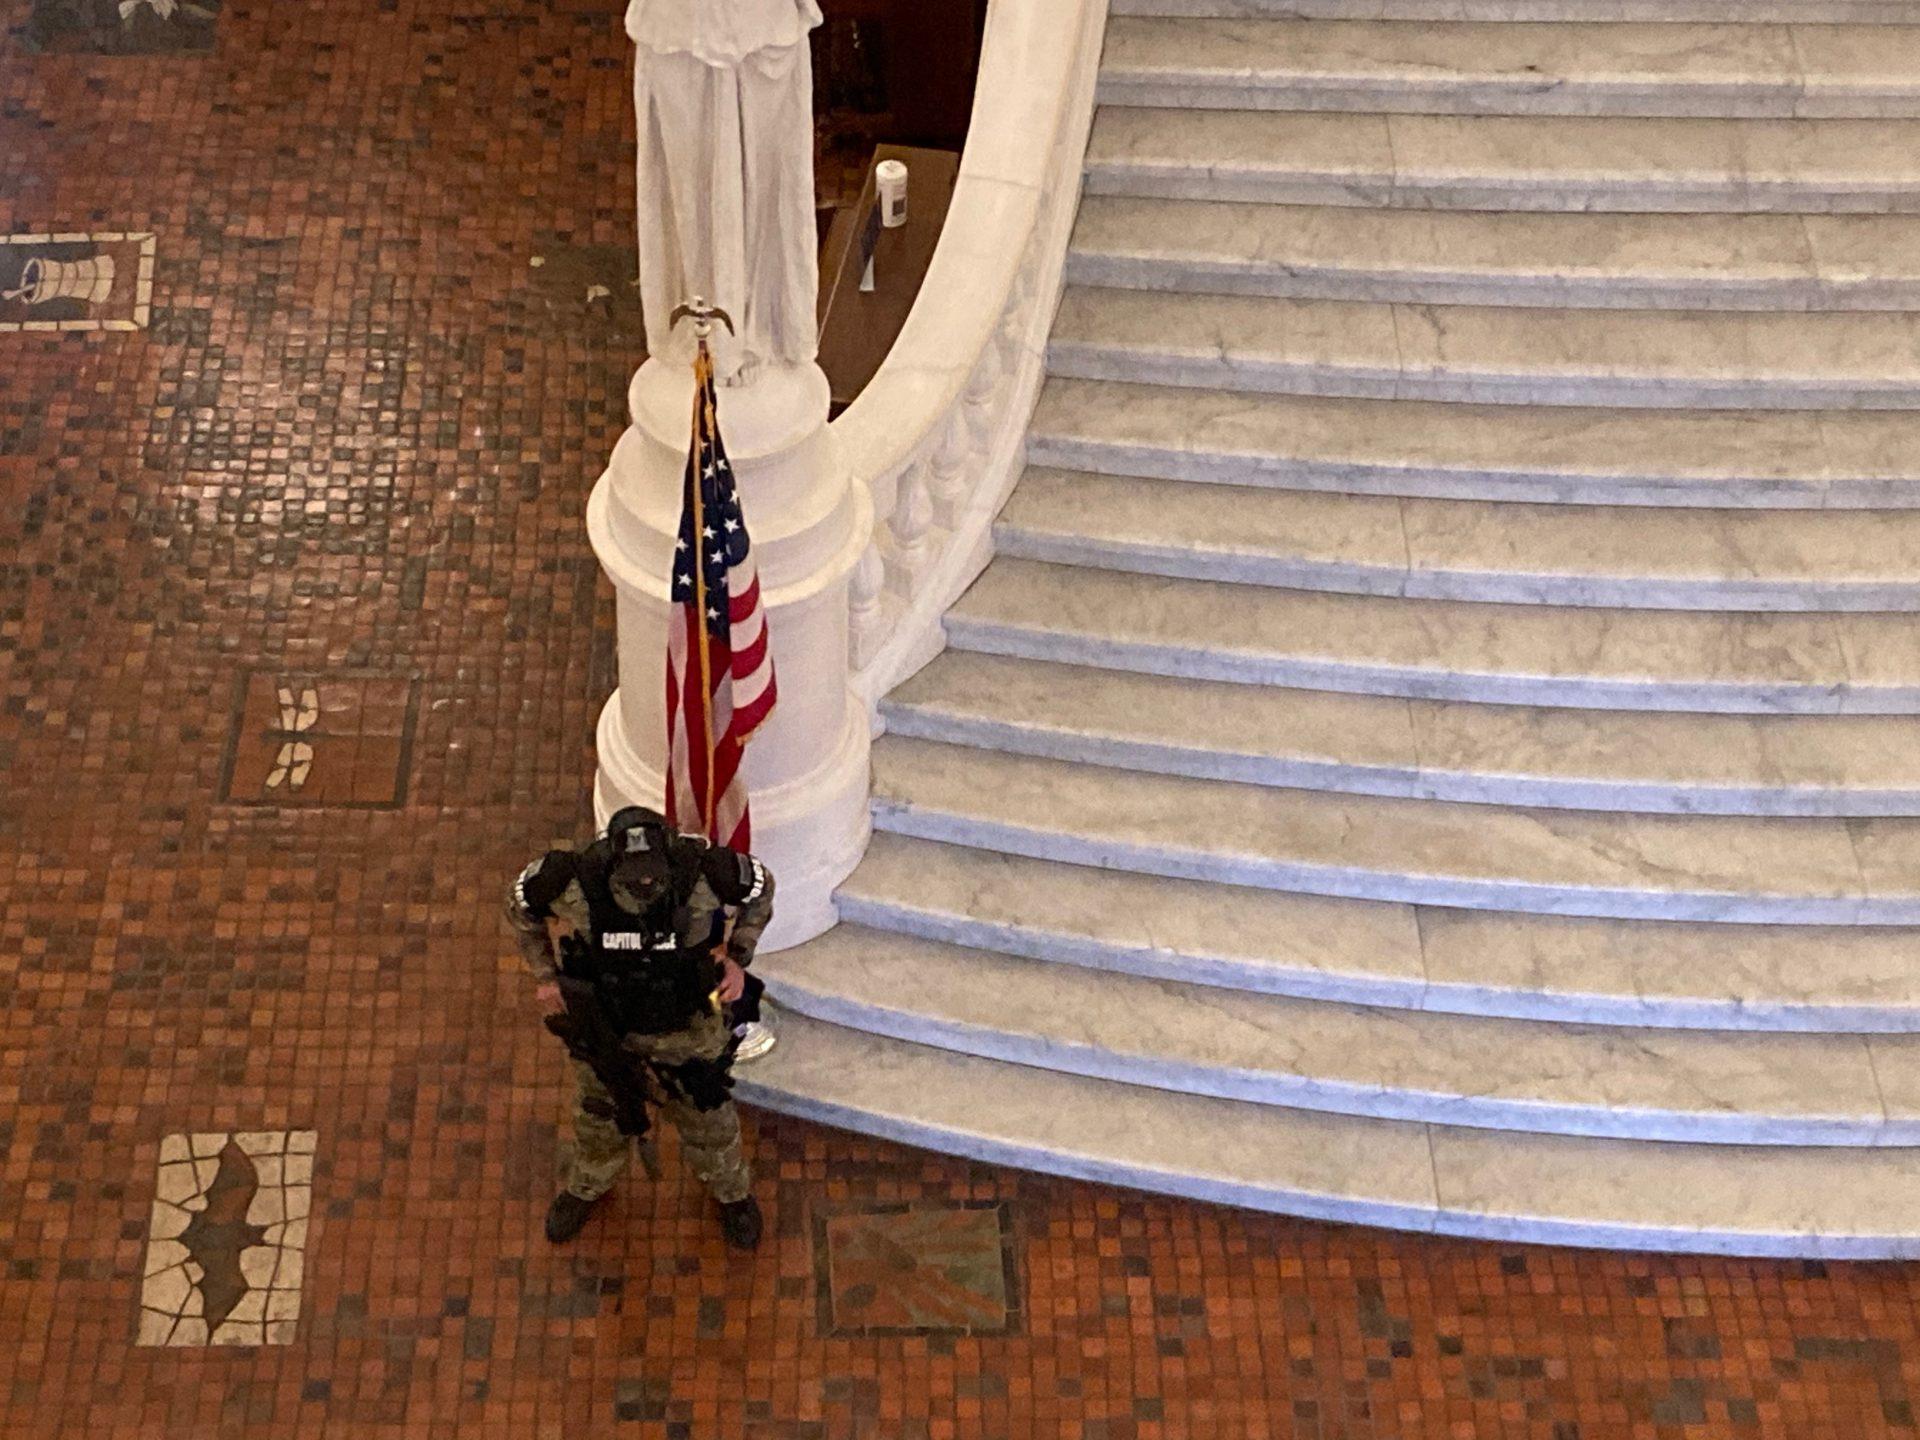 An armed Pennsylvania Capitol Police officer guards the rotunda at the Pennsylvania Capitol on Jan. 12, 2021.